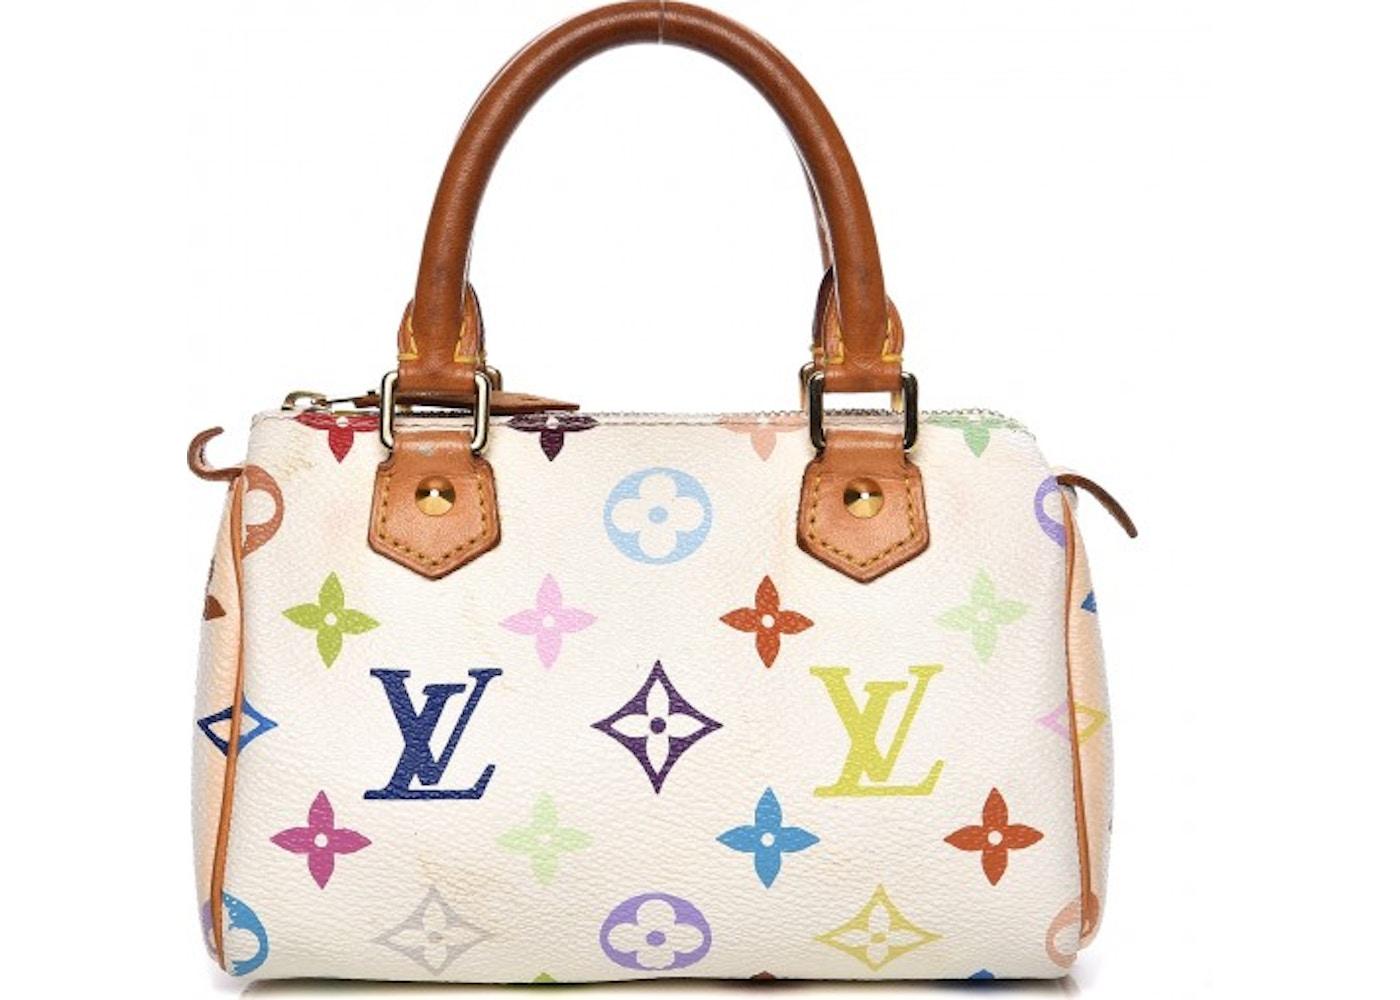 2068249f430c Louis Vuitton Speedy Sac HL Monogram Multicolor Mini White. Monogram  Multicolor Mini White